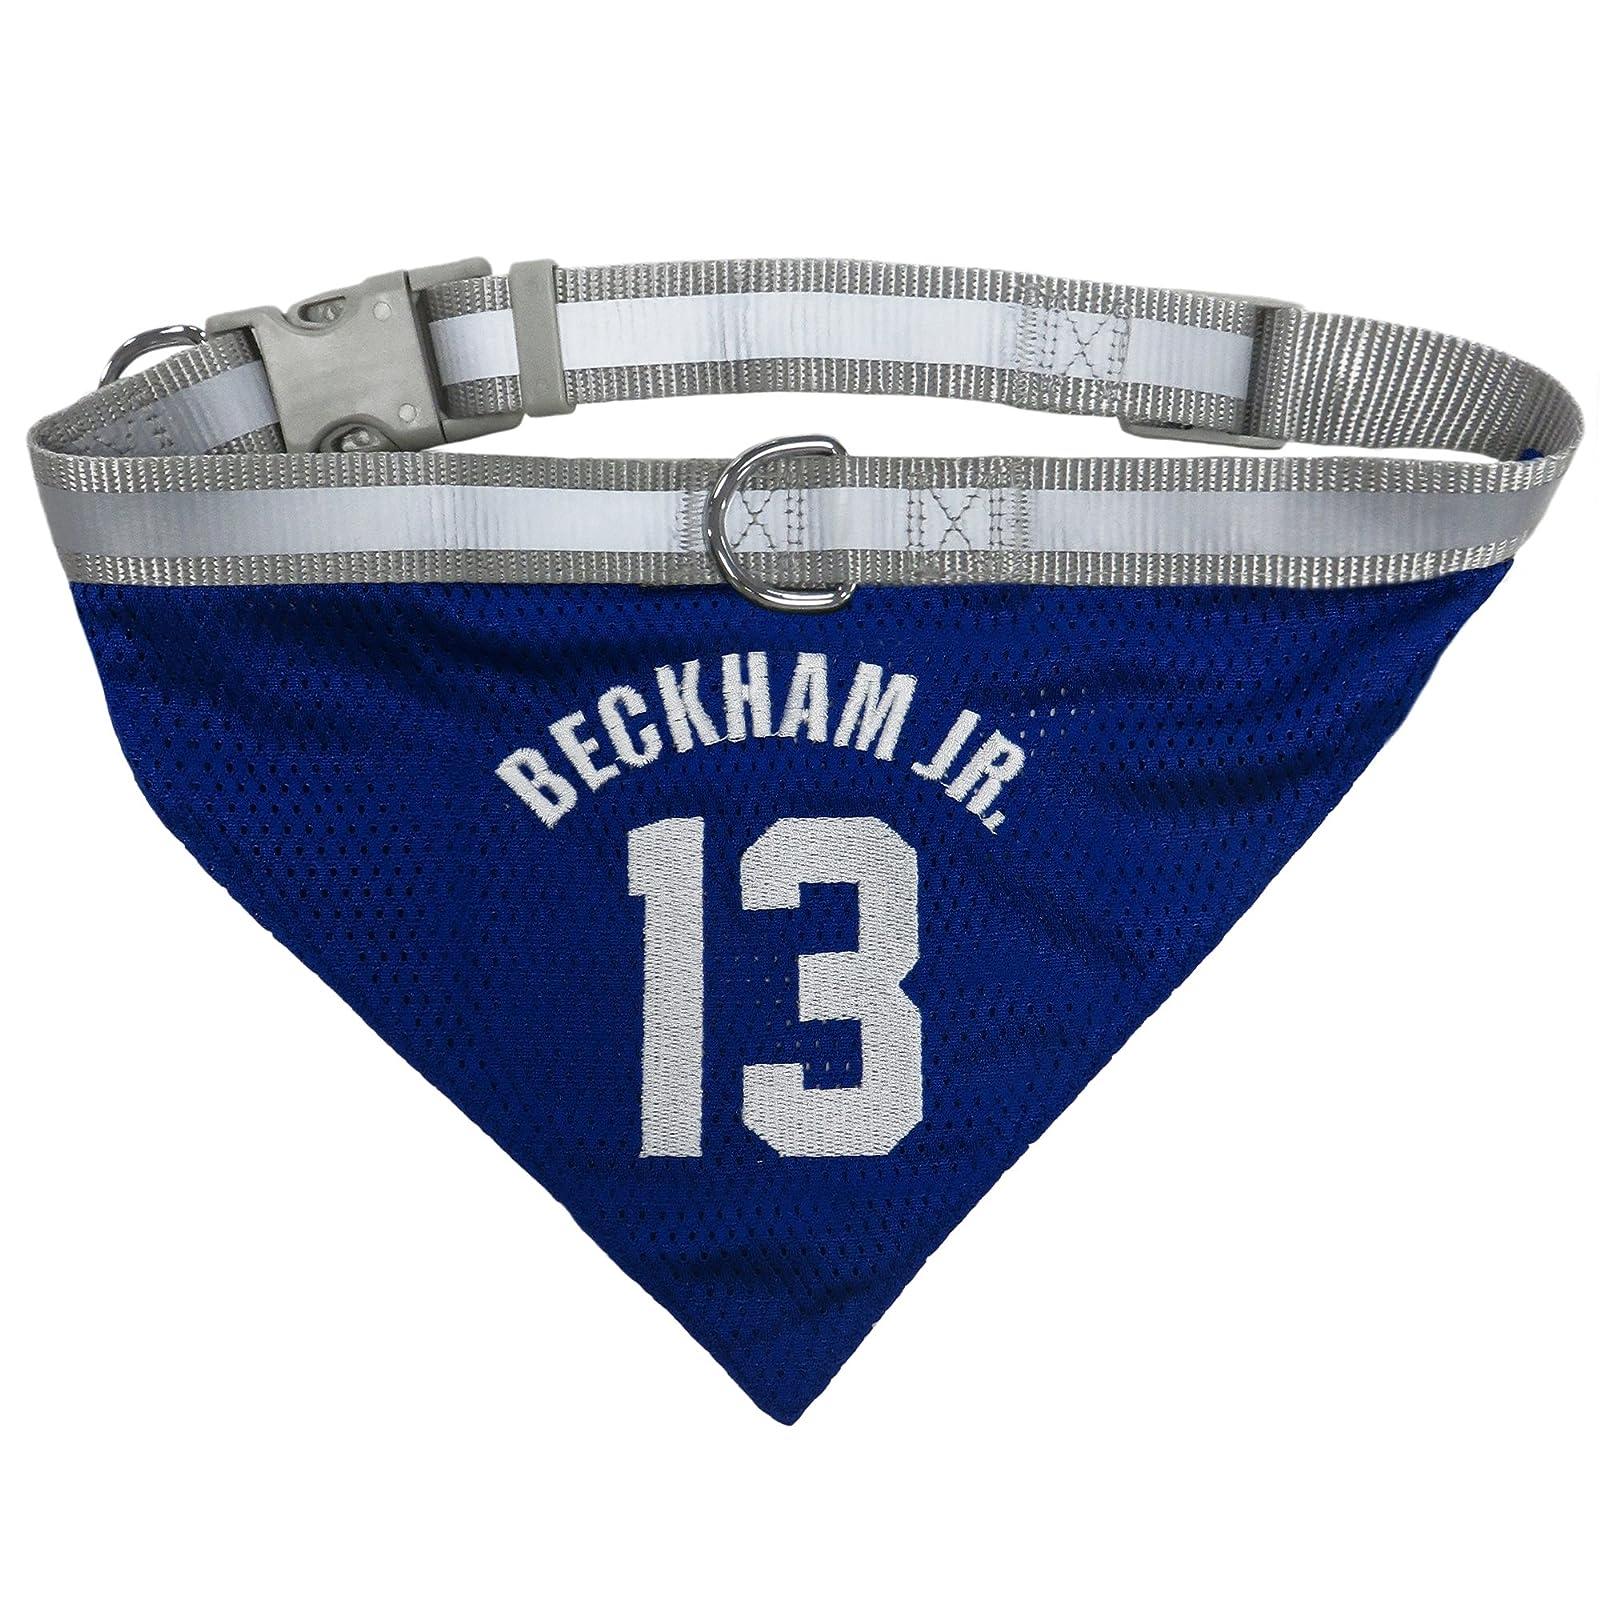 NFLPA Dog Bandana - Odell Beckham JR #13 Odell Beckham Jr - 2